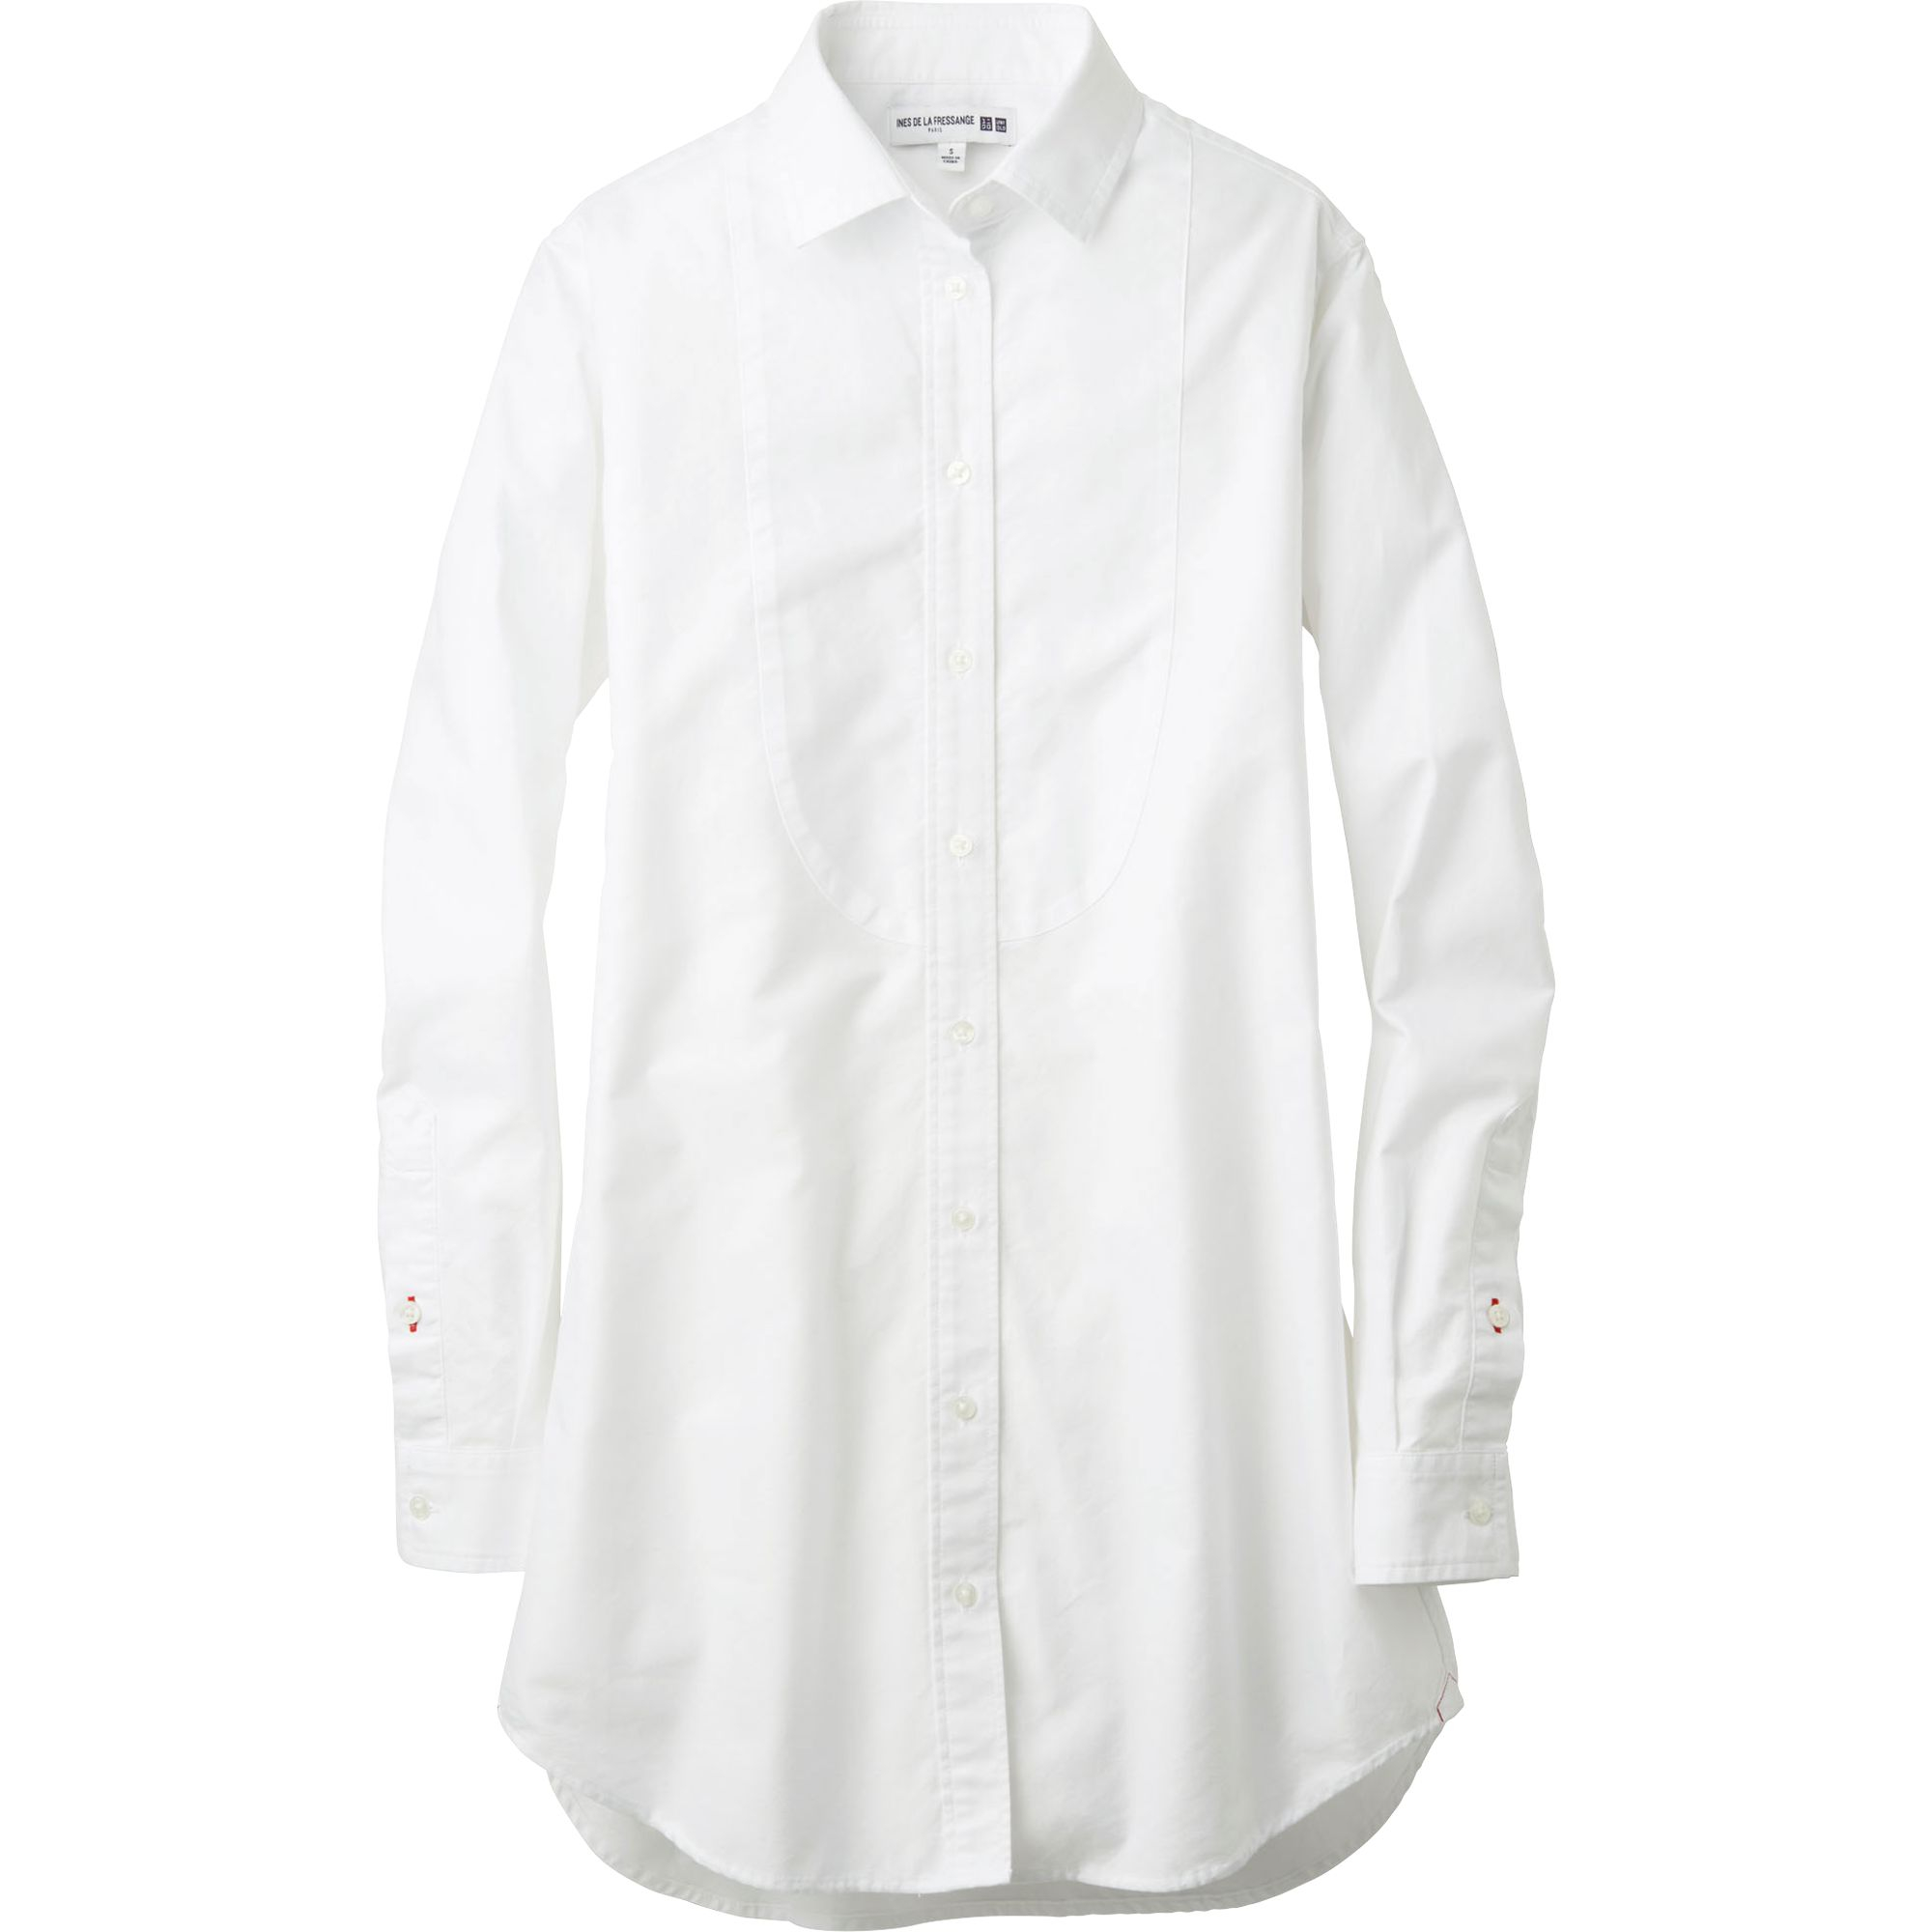 Uniqlo Women Idlf Oxford Long Sleeve Long Shirt In White